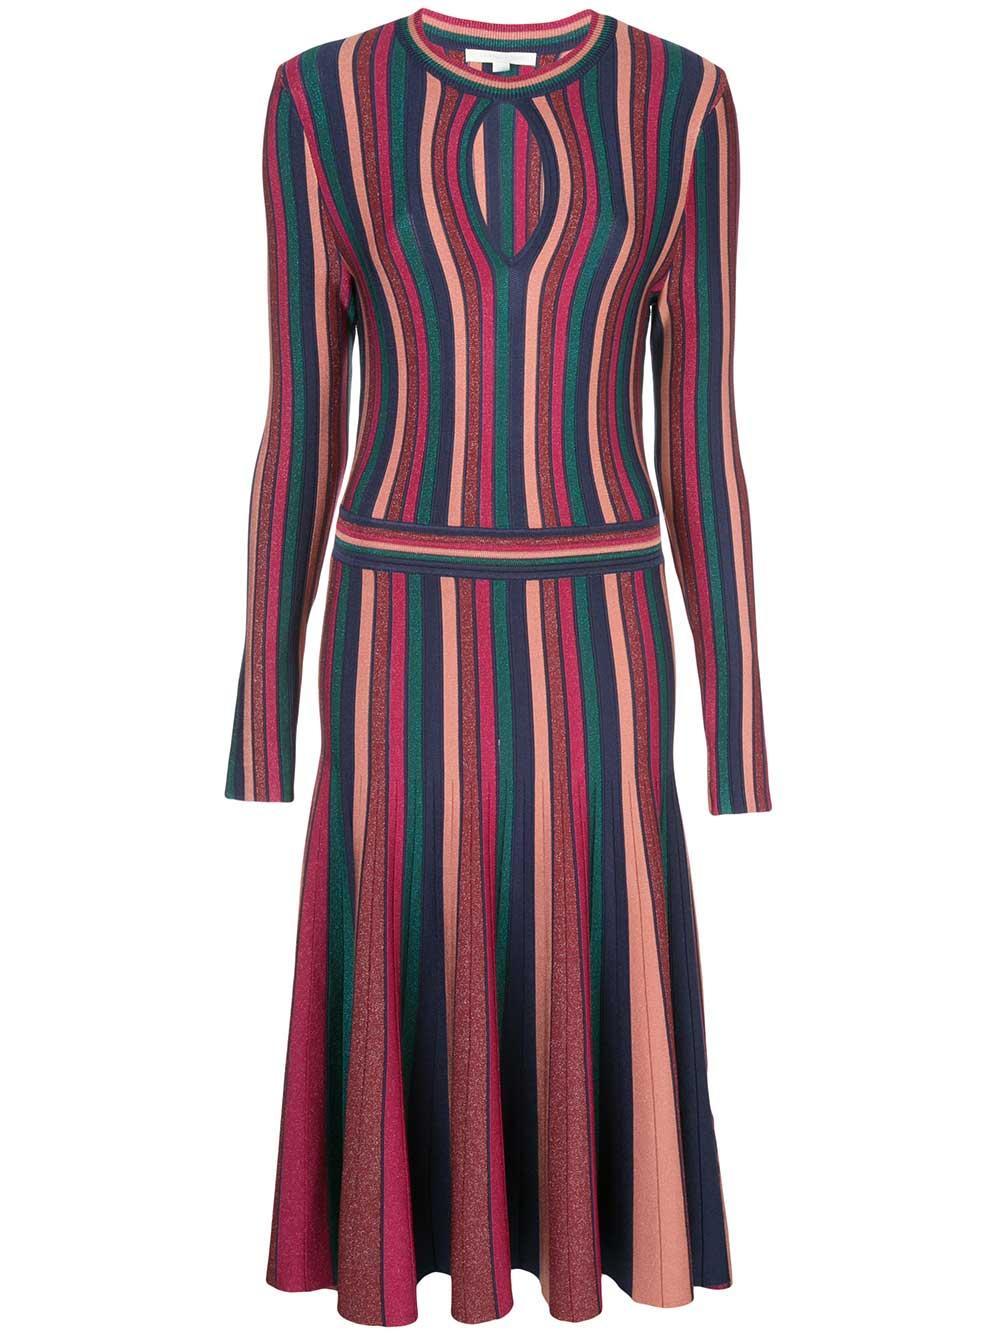 Long Sleeve Metallic Stripe Keyhole Dress Item # 120-1011-K